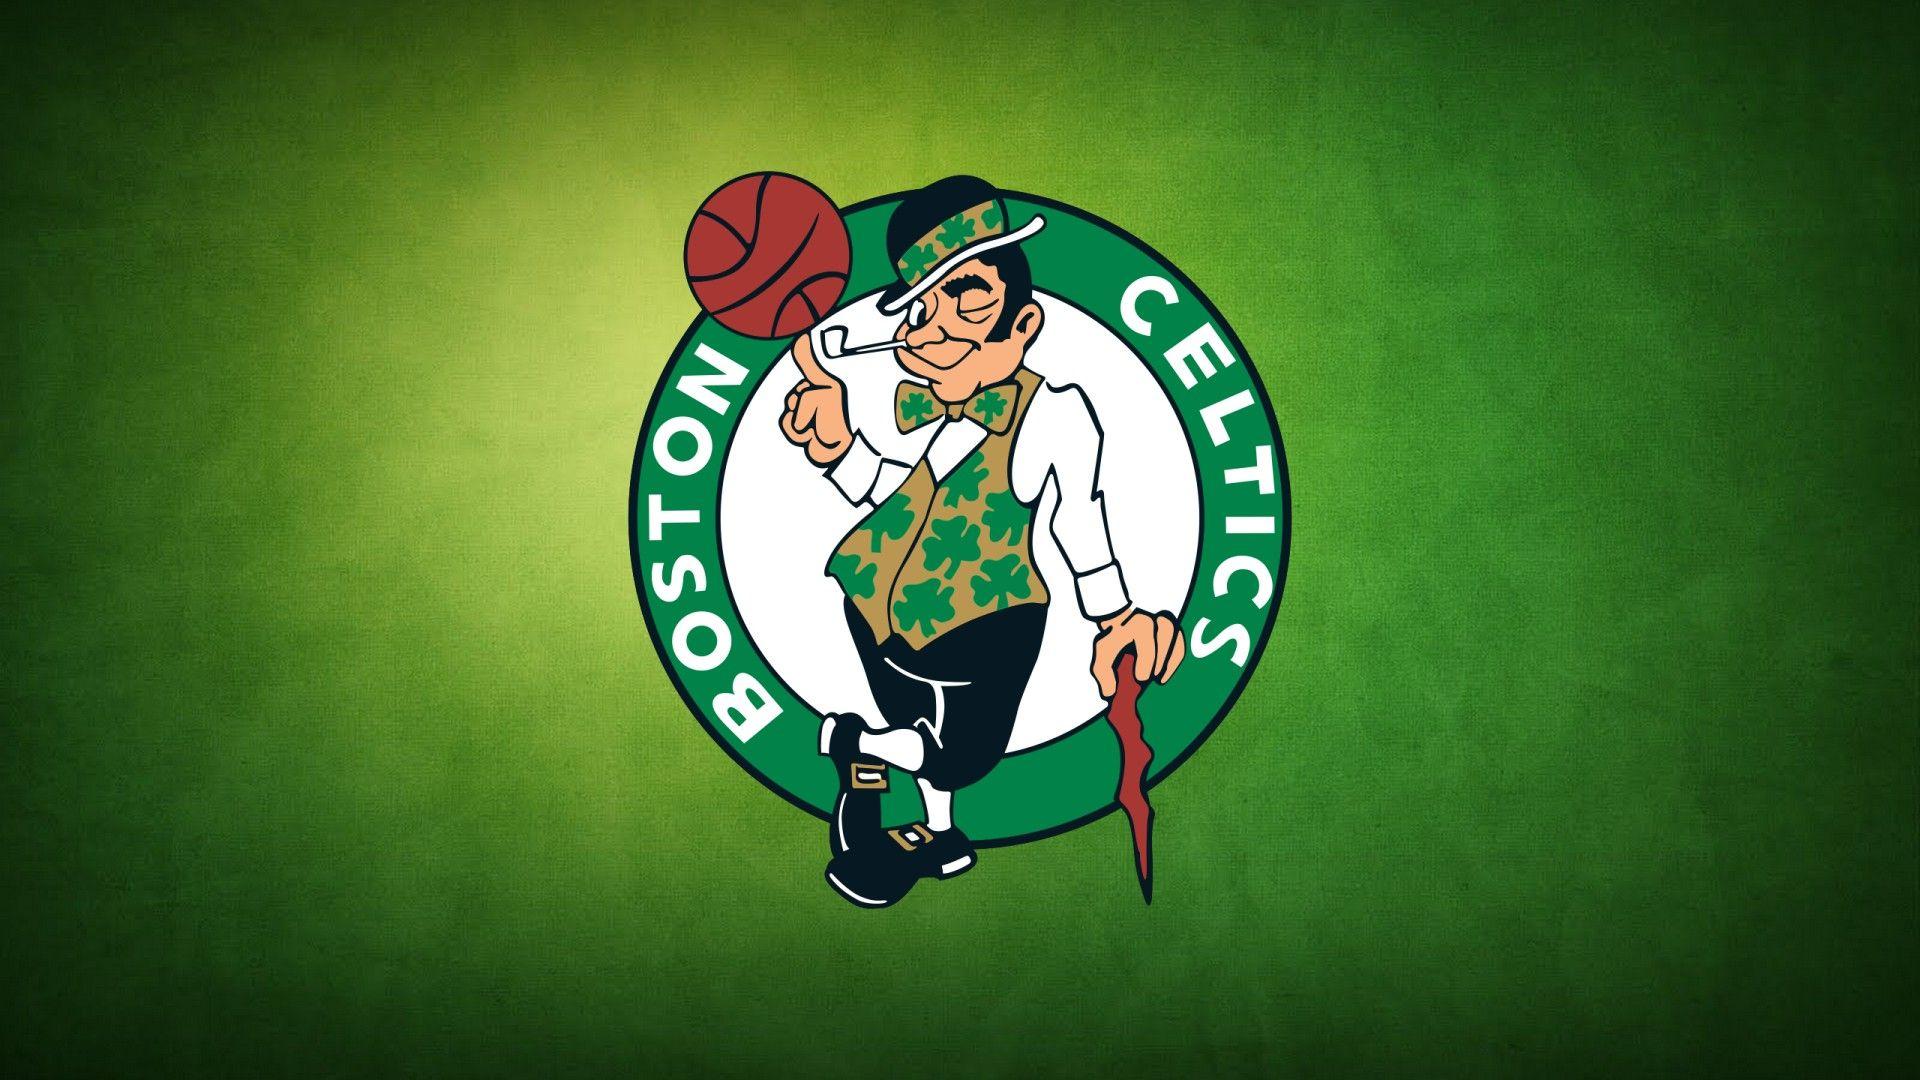 Boston Celtics Desktop Wallpaper 2021 Basketball Wallpaper Basketball Wallpaper Basketball Wallpapers Hd Boston Celtics